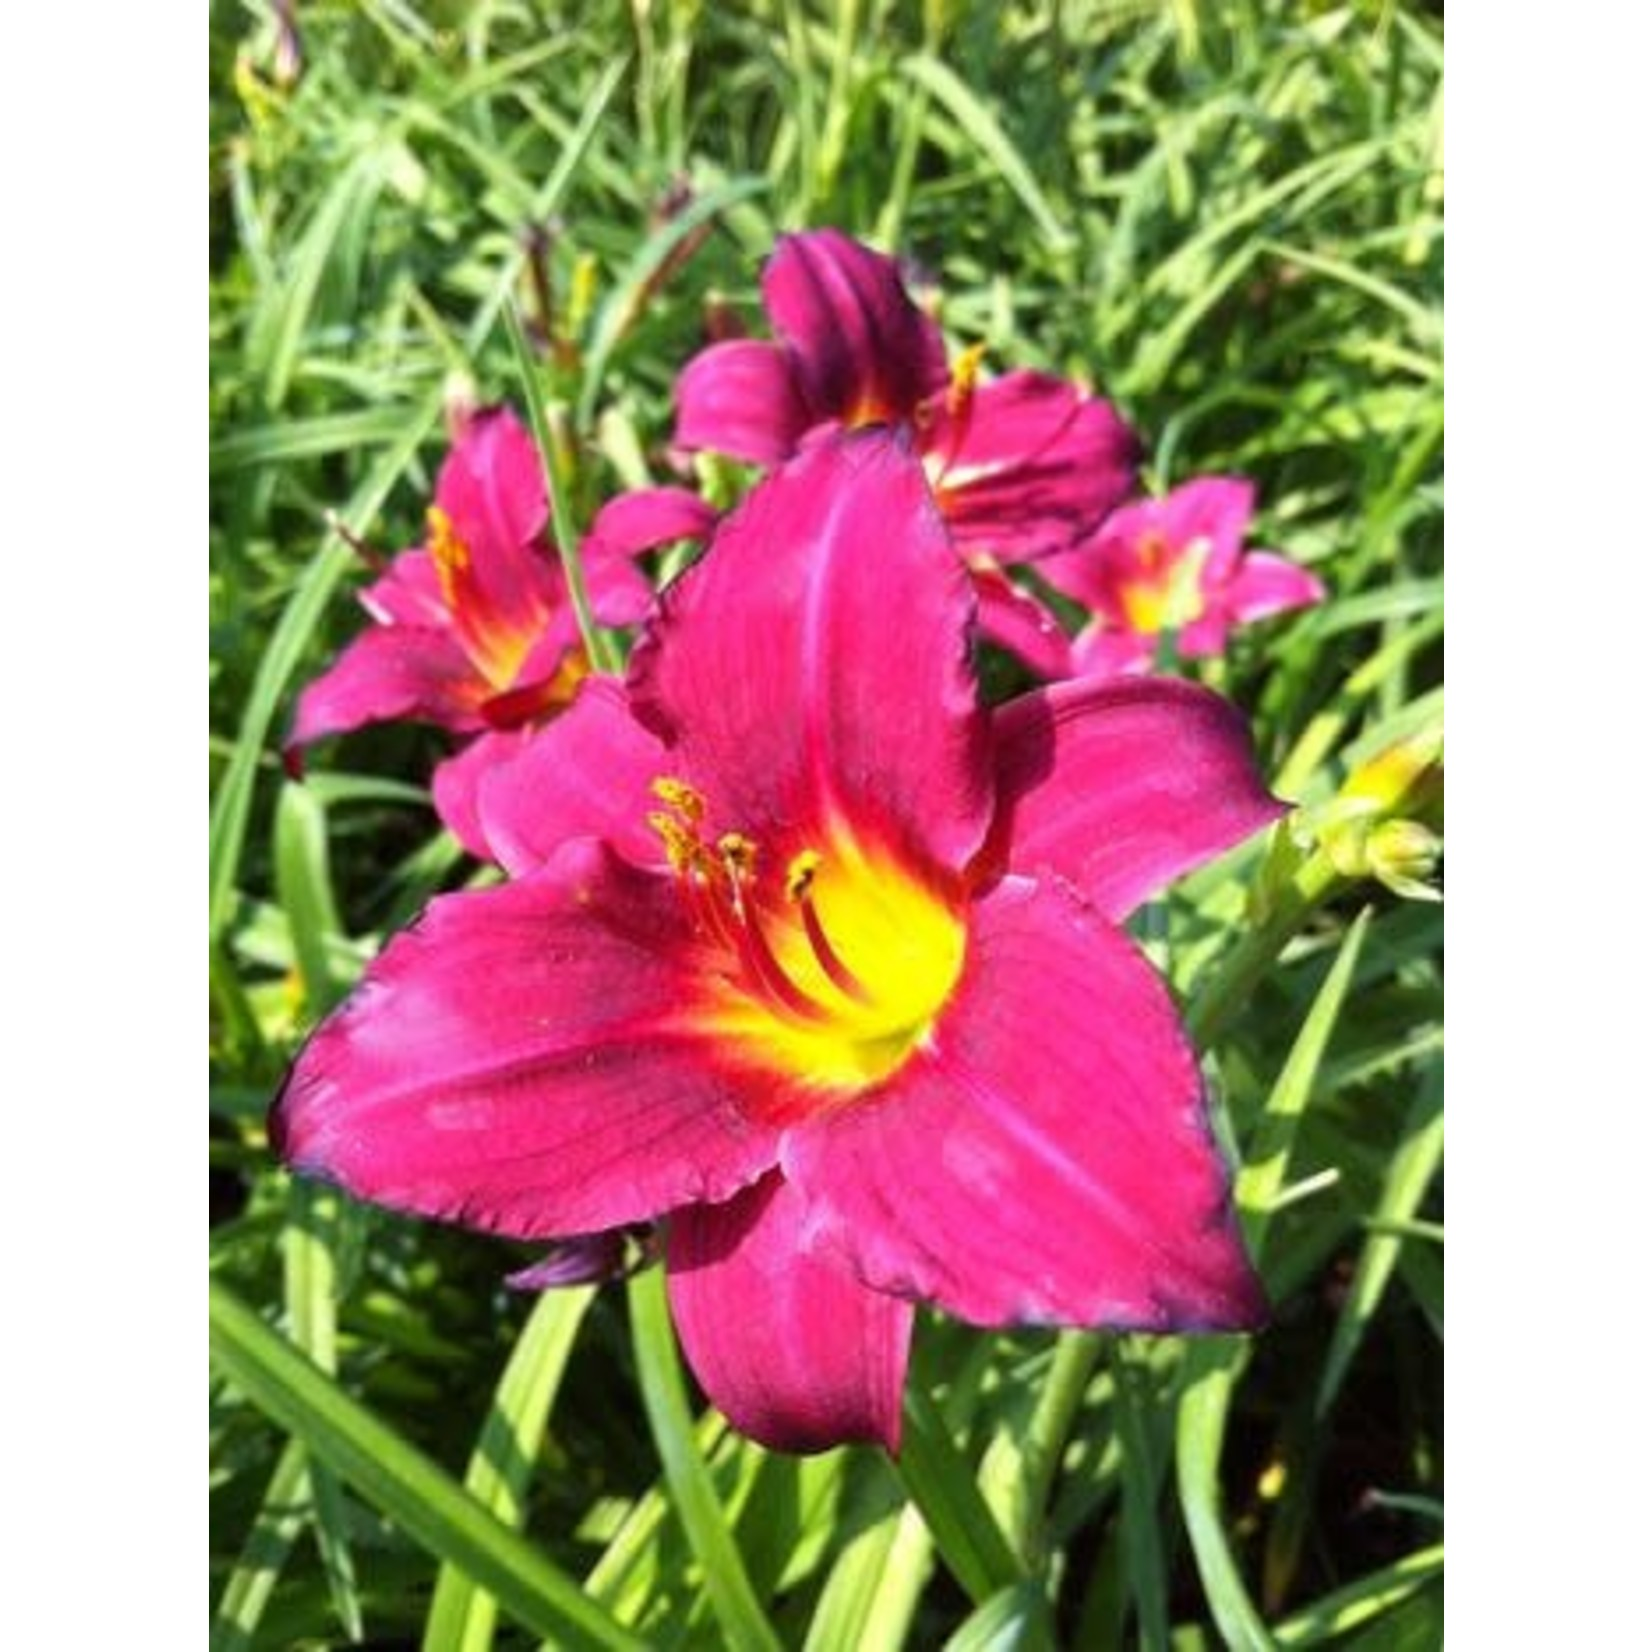 Daylily - Hemerocallis 'pardon me' - 1 gal